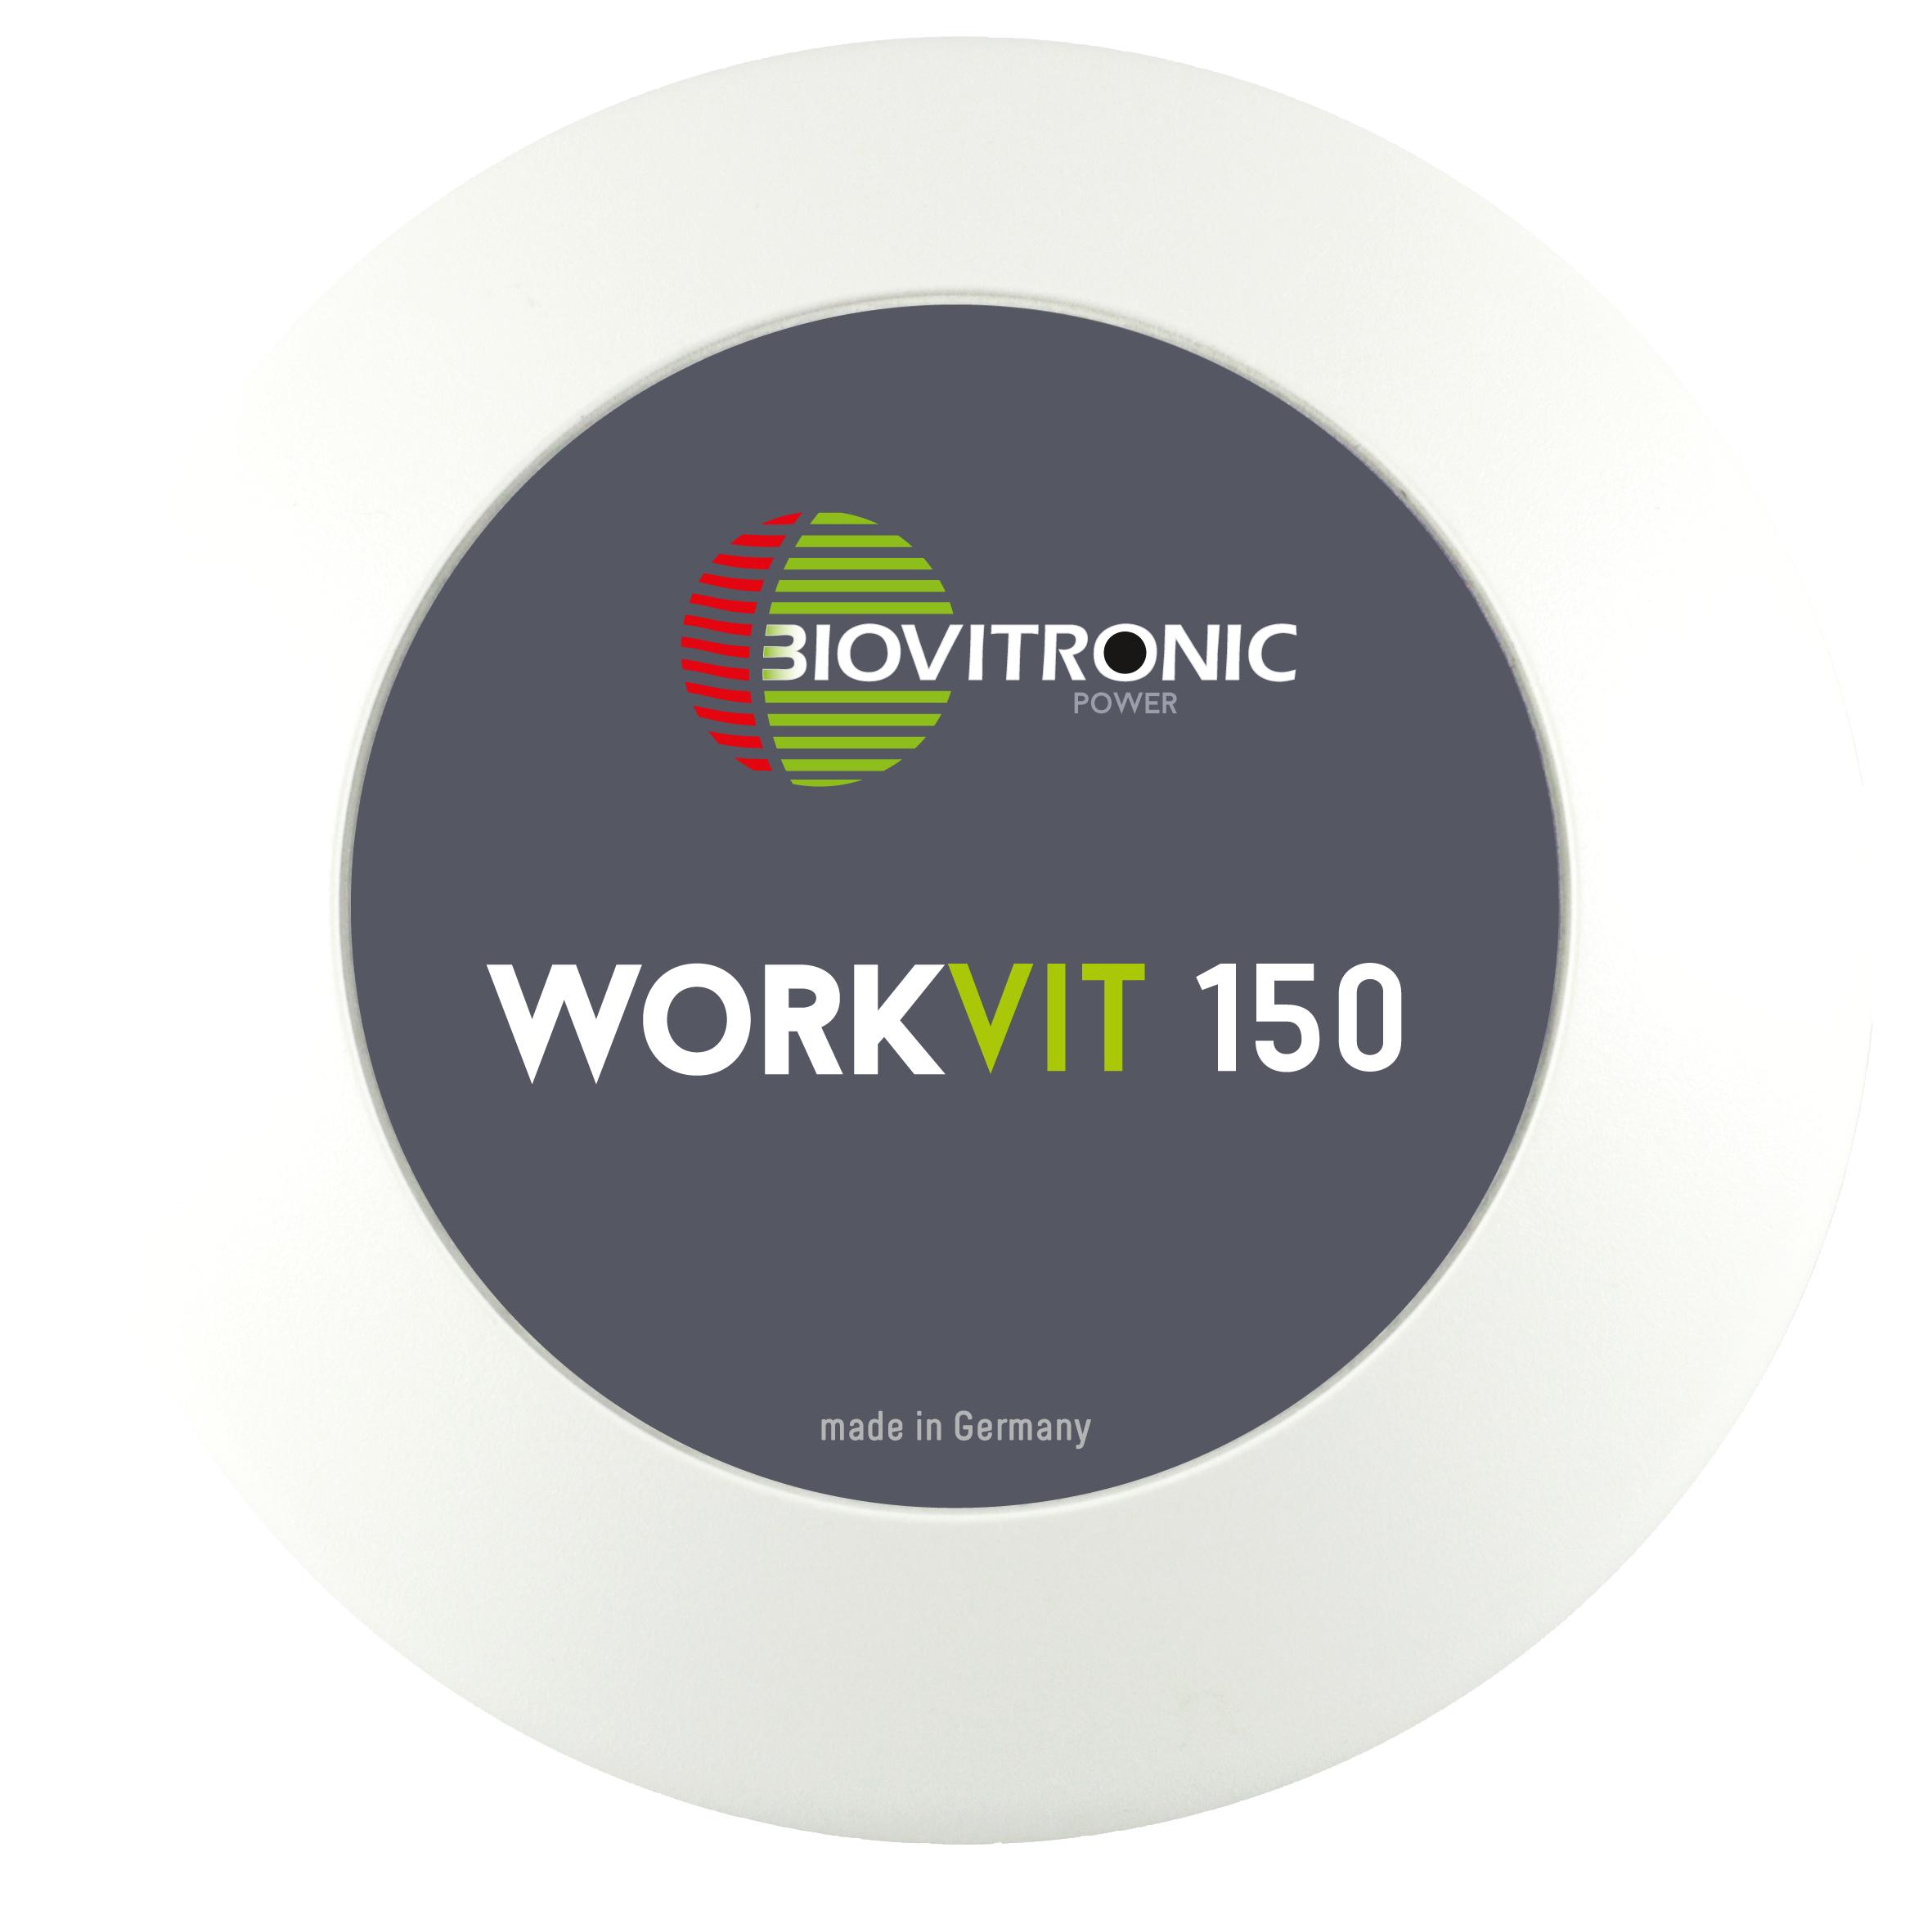 WorkVit 150 Biovitronic Vitalizer